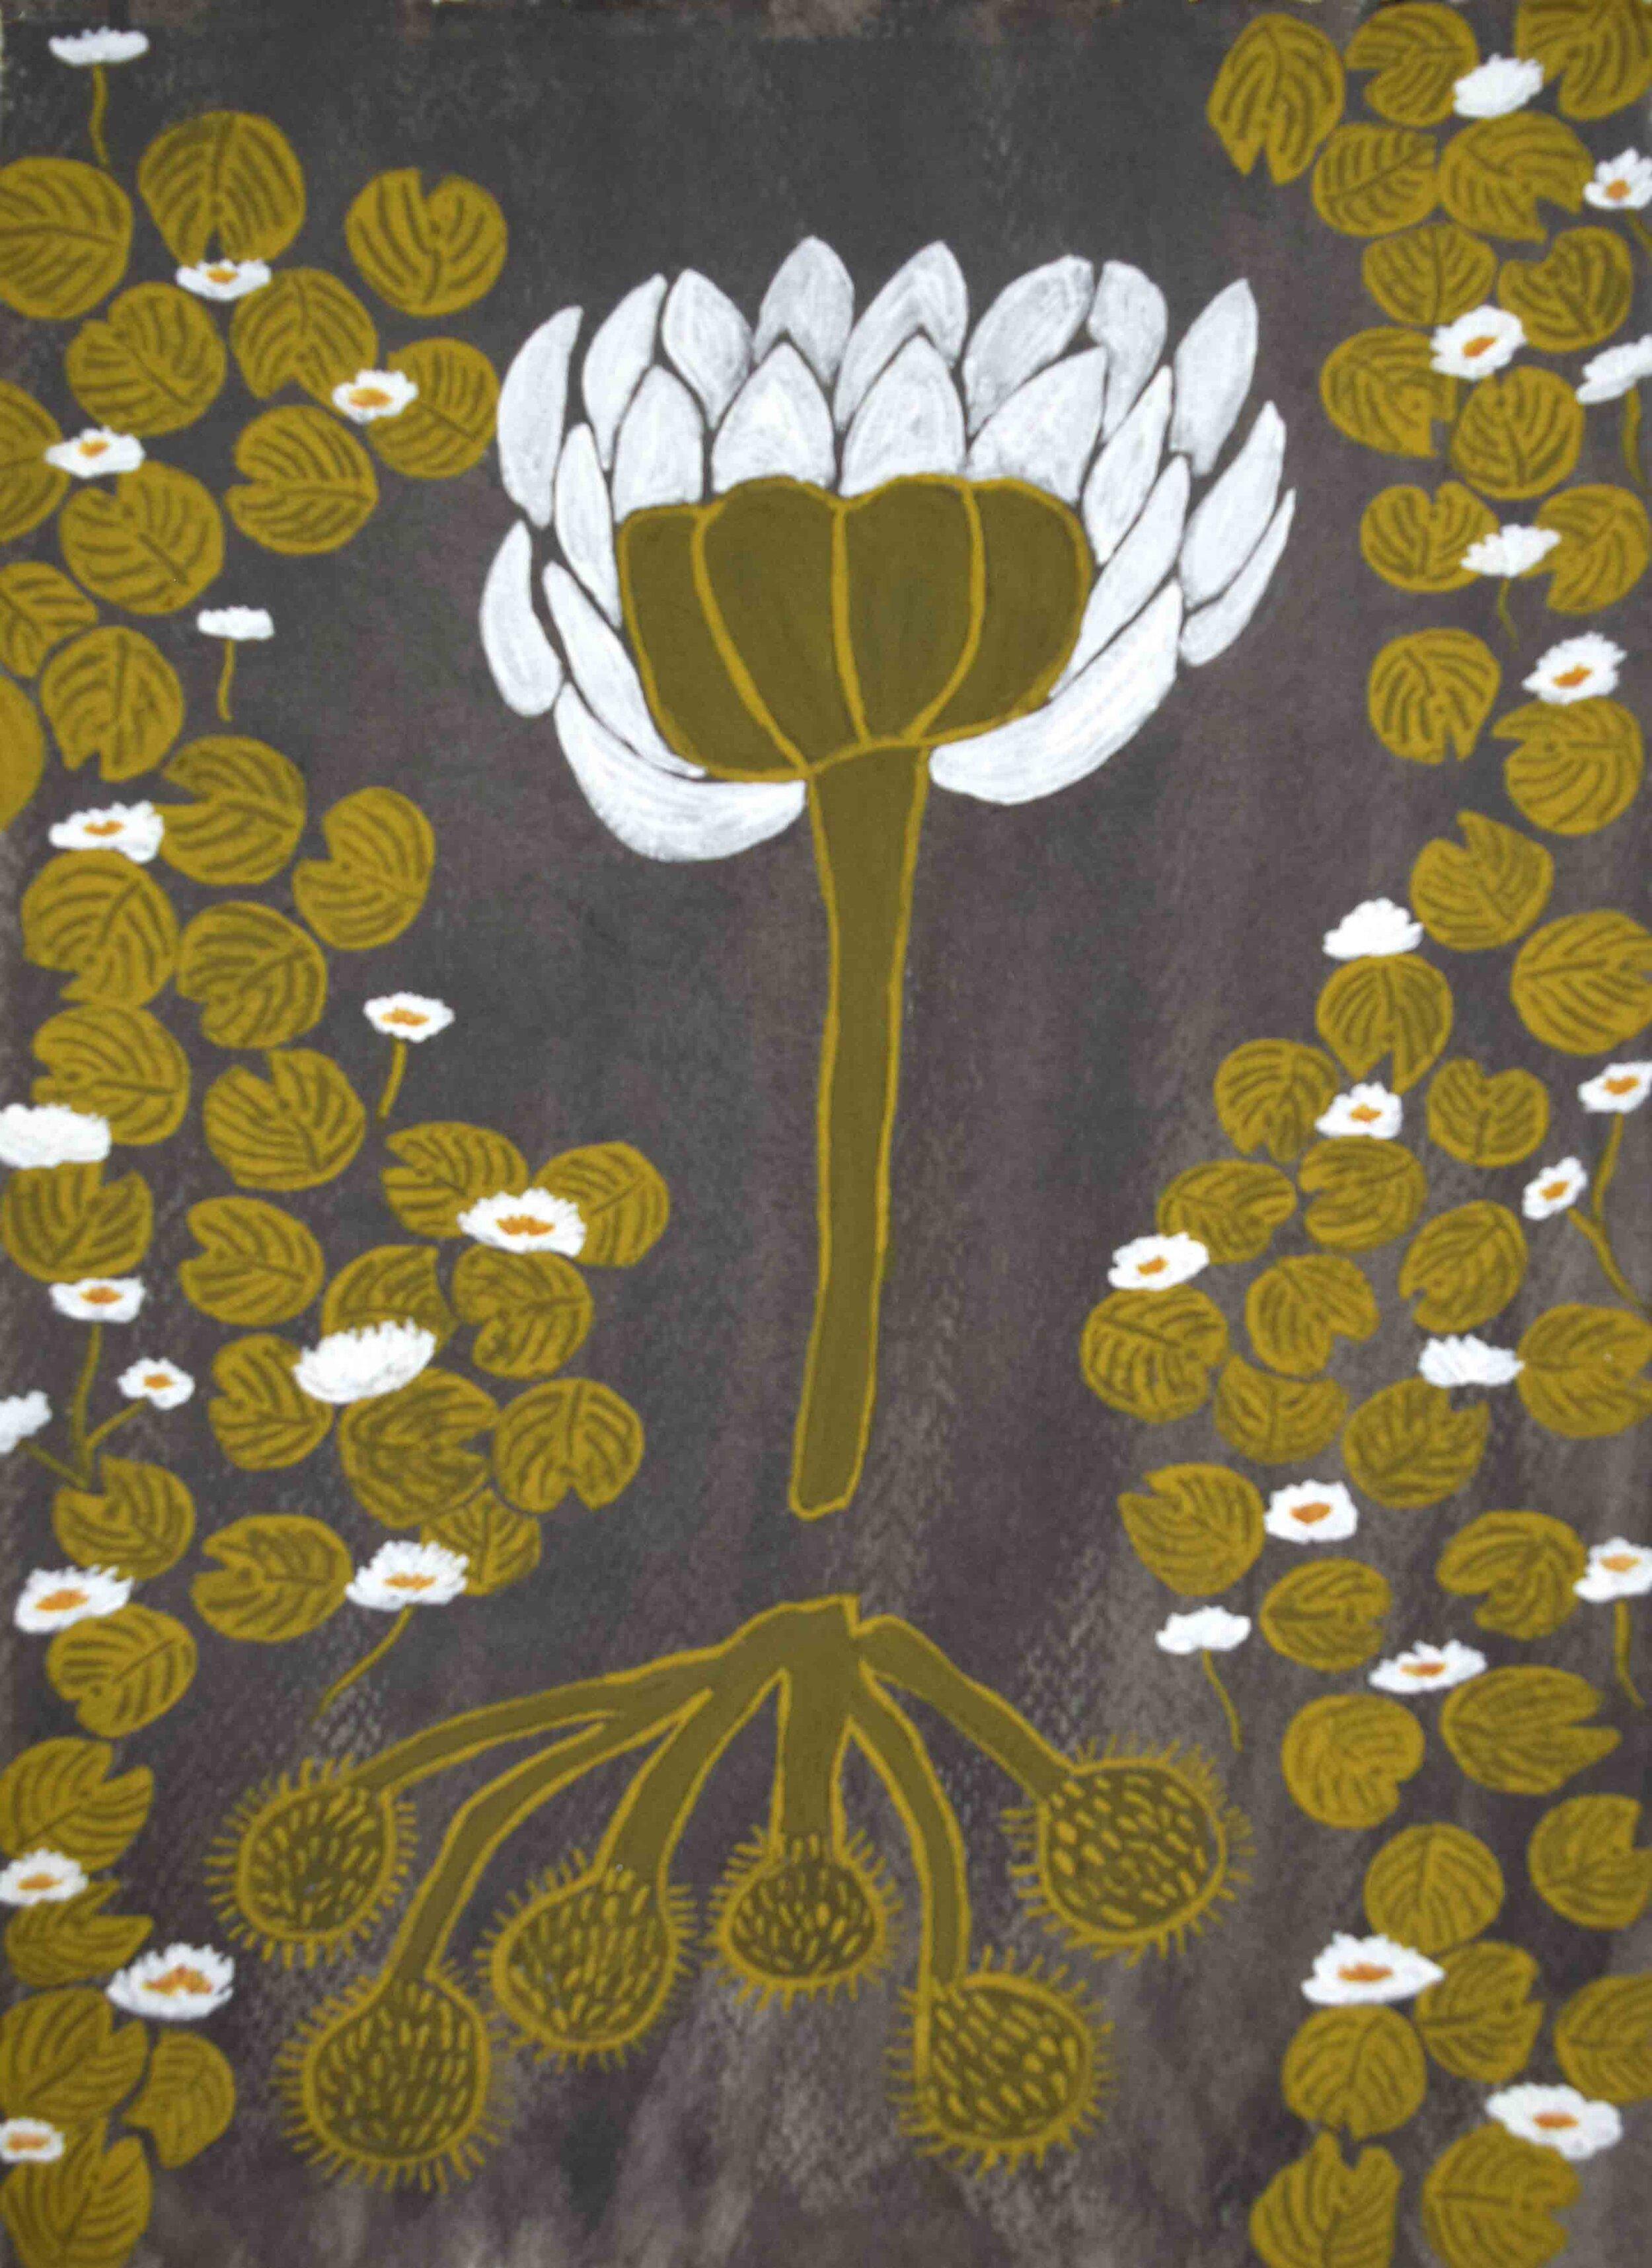 63. Jan Griffiths, Garnngooning, 2019, natural pigment on paper, 42 x 30 cm $350